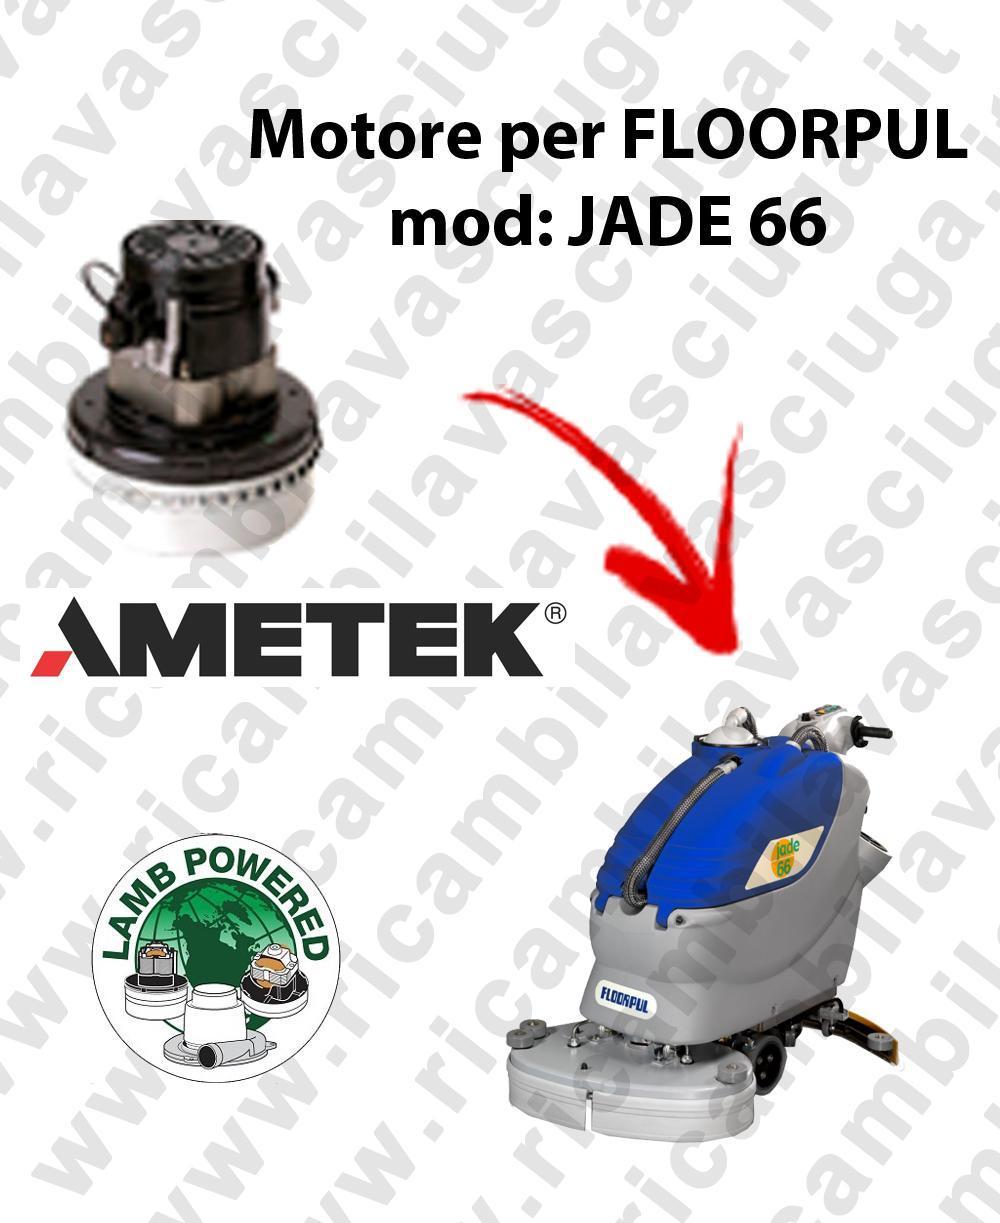 JADE 66 Motore de aspiración LAMB AMETEK para fregadora FLOORPUL